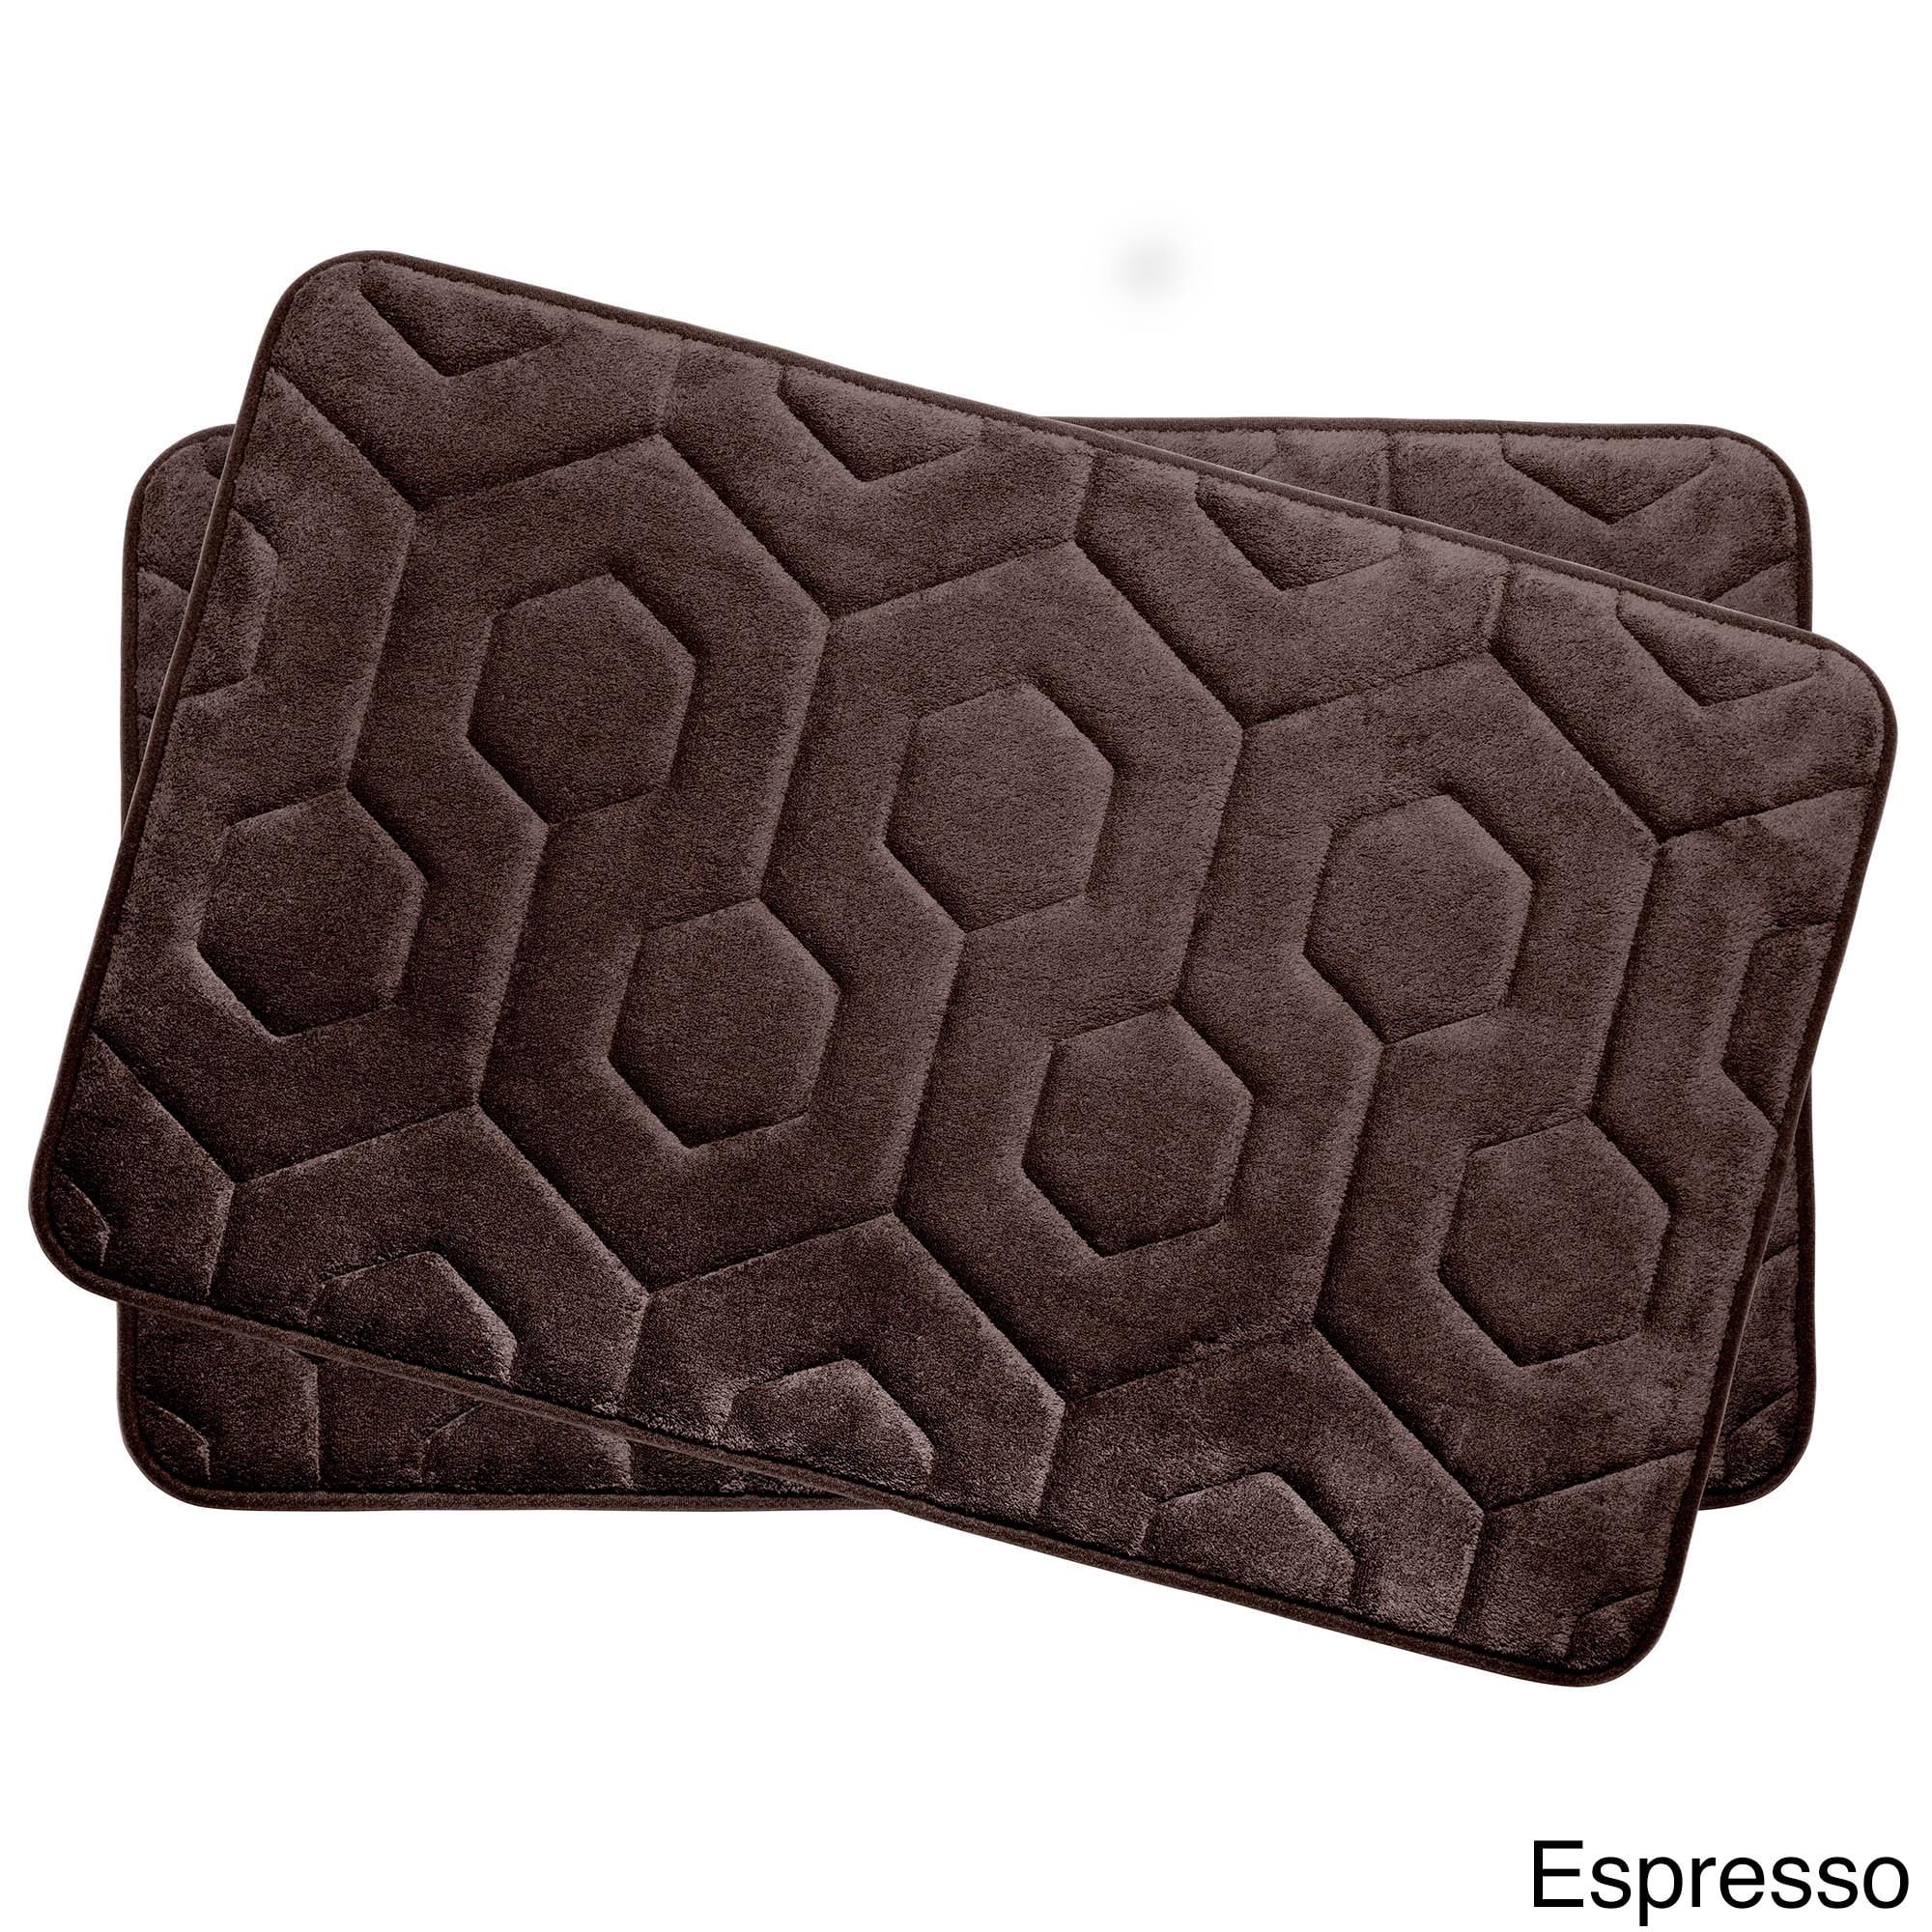 Espresso Sn On Carpet Carpet Vidalondon